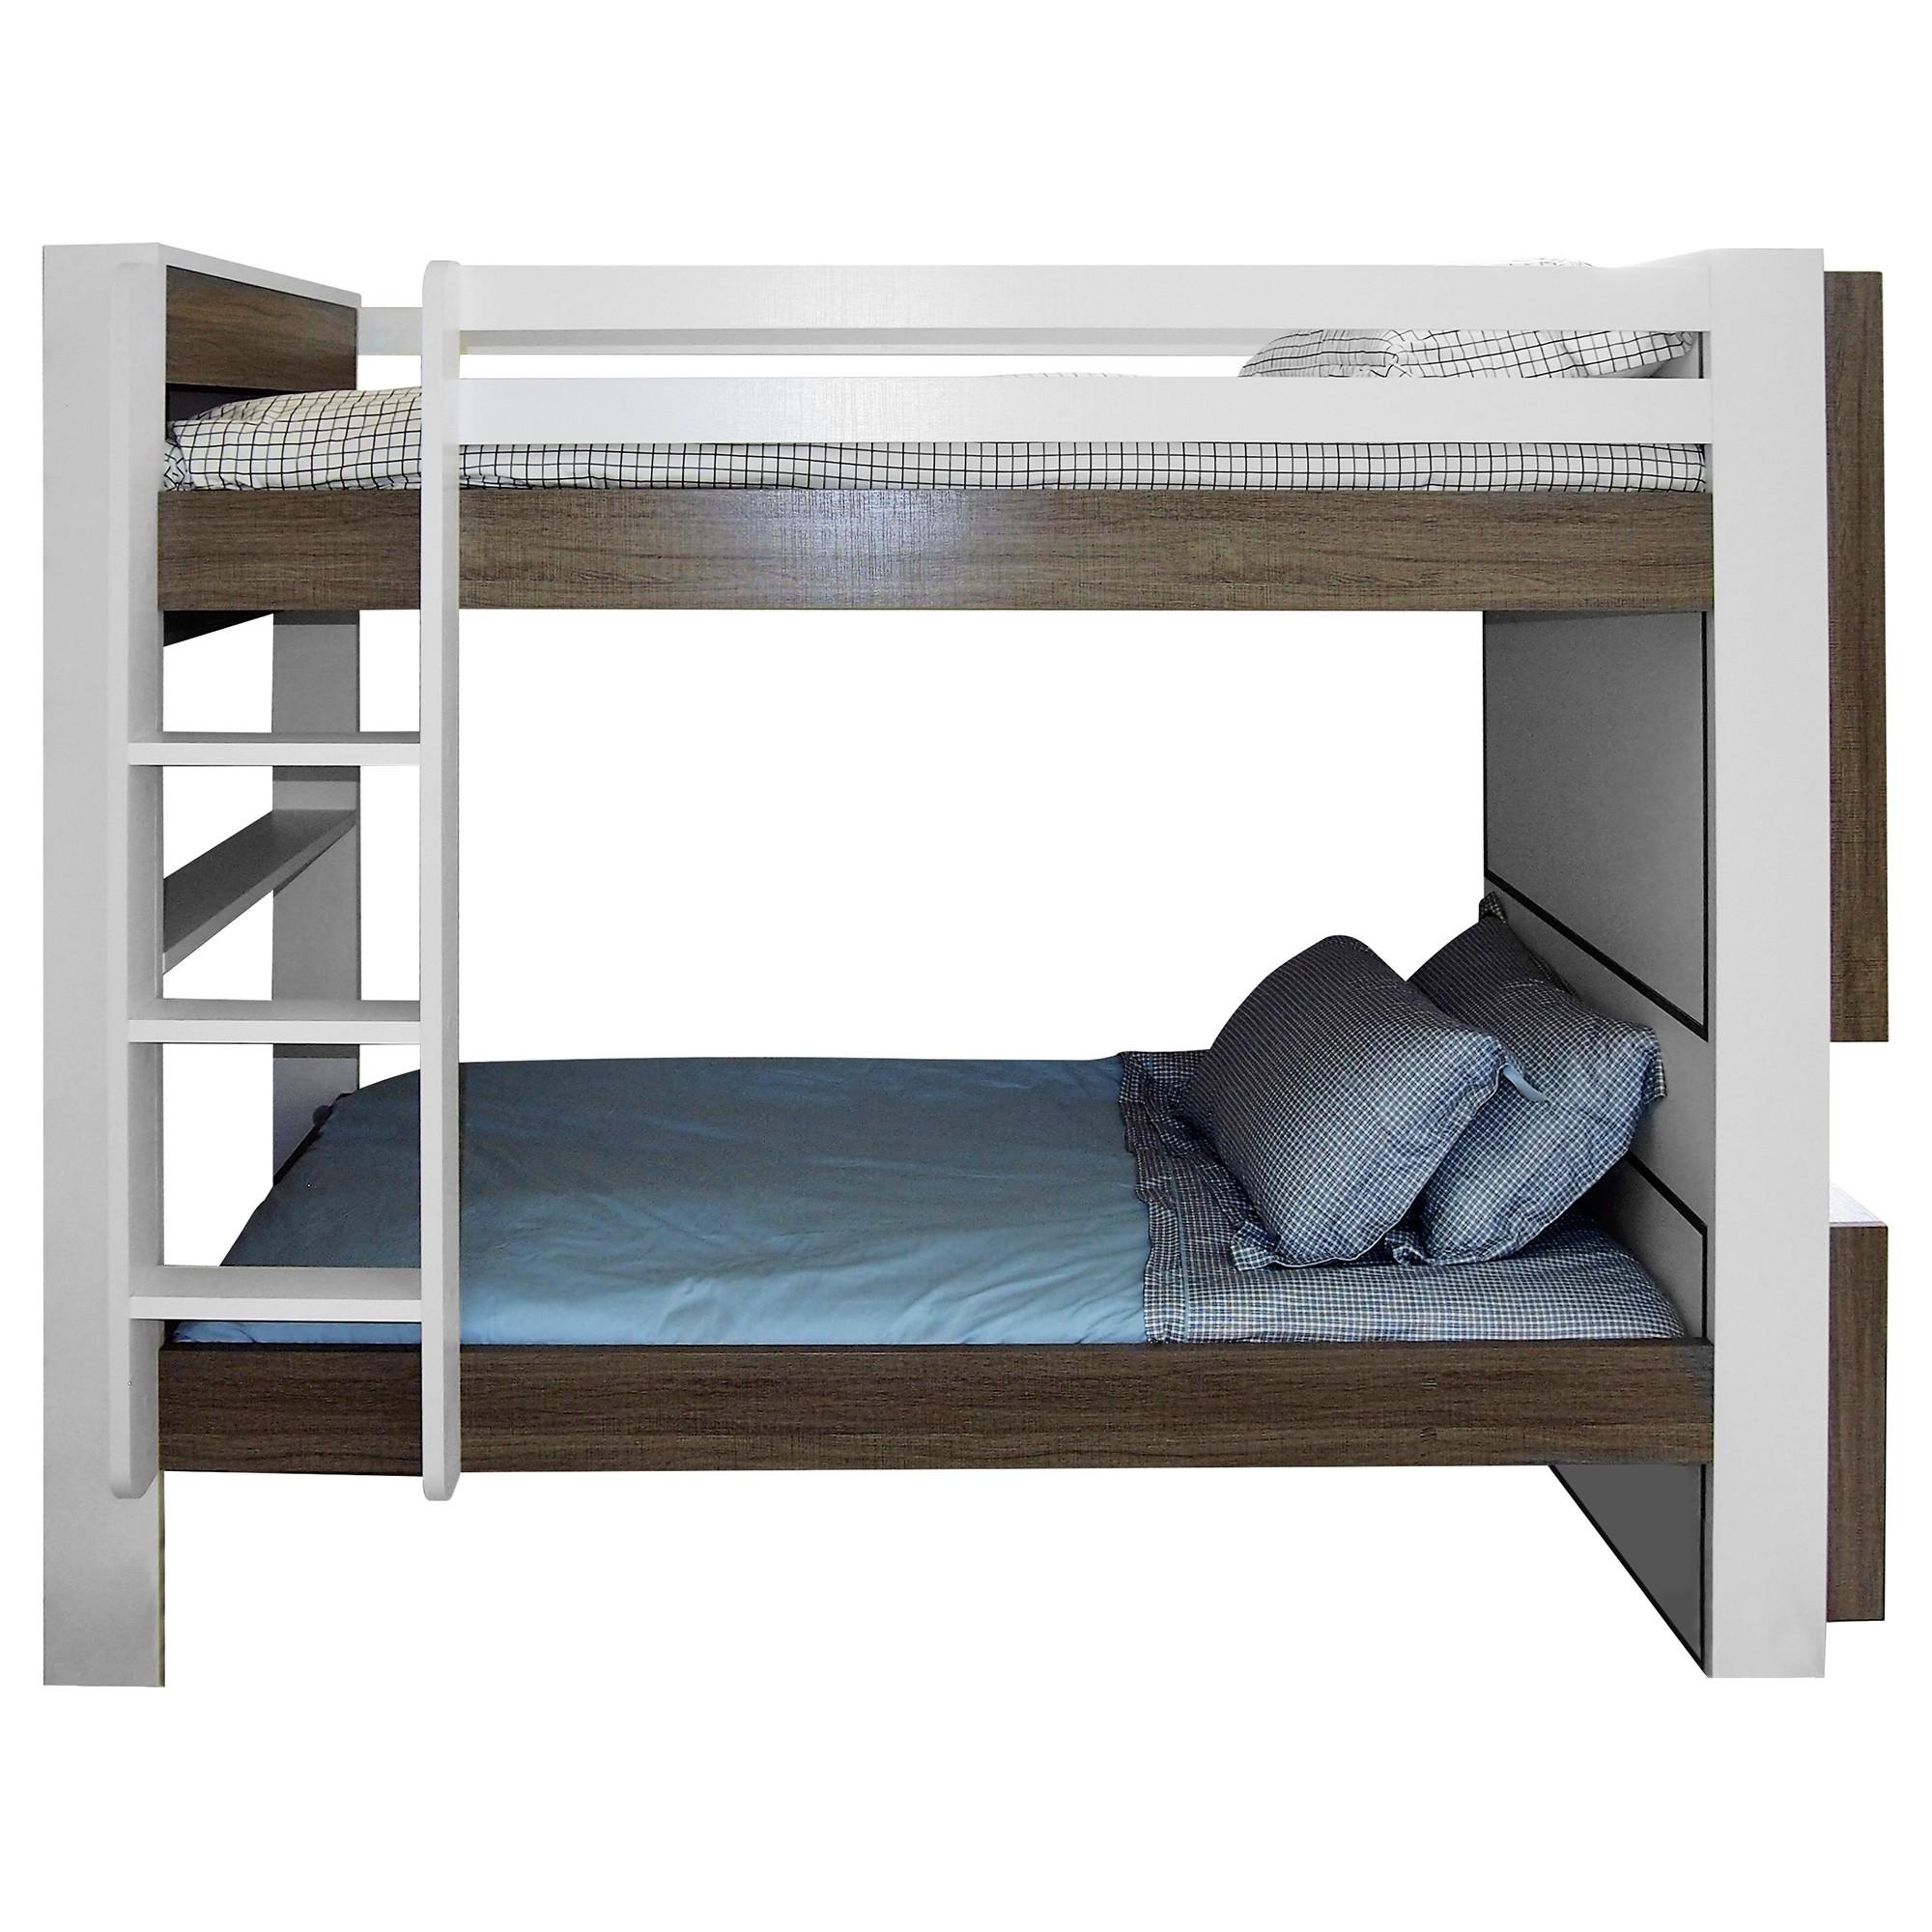 Aero Bunk Bed with Storage Shelf, King Single